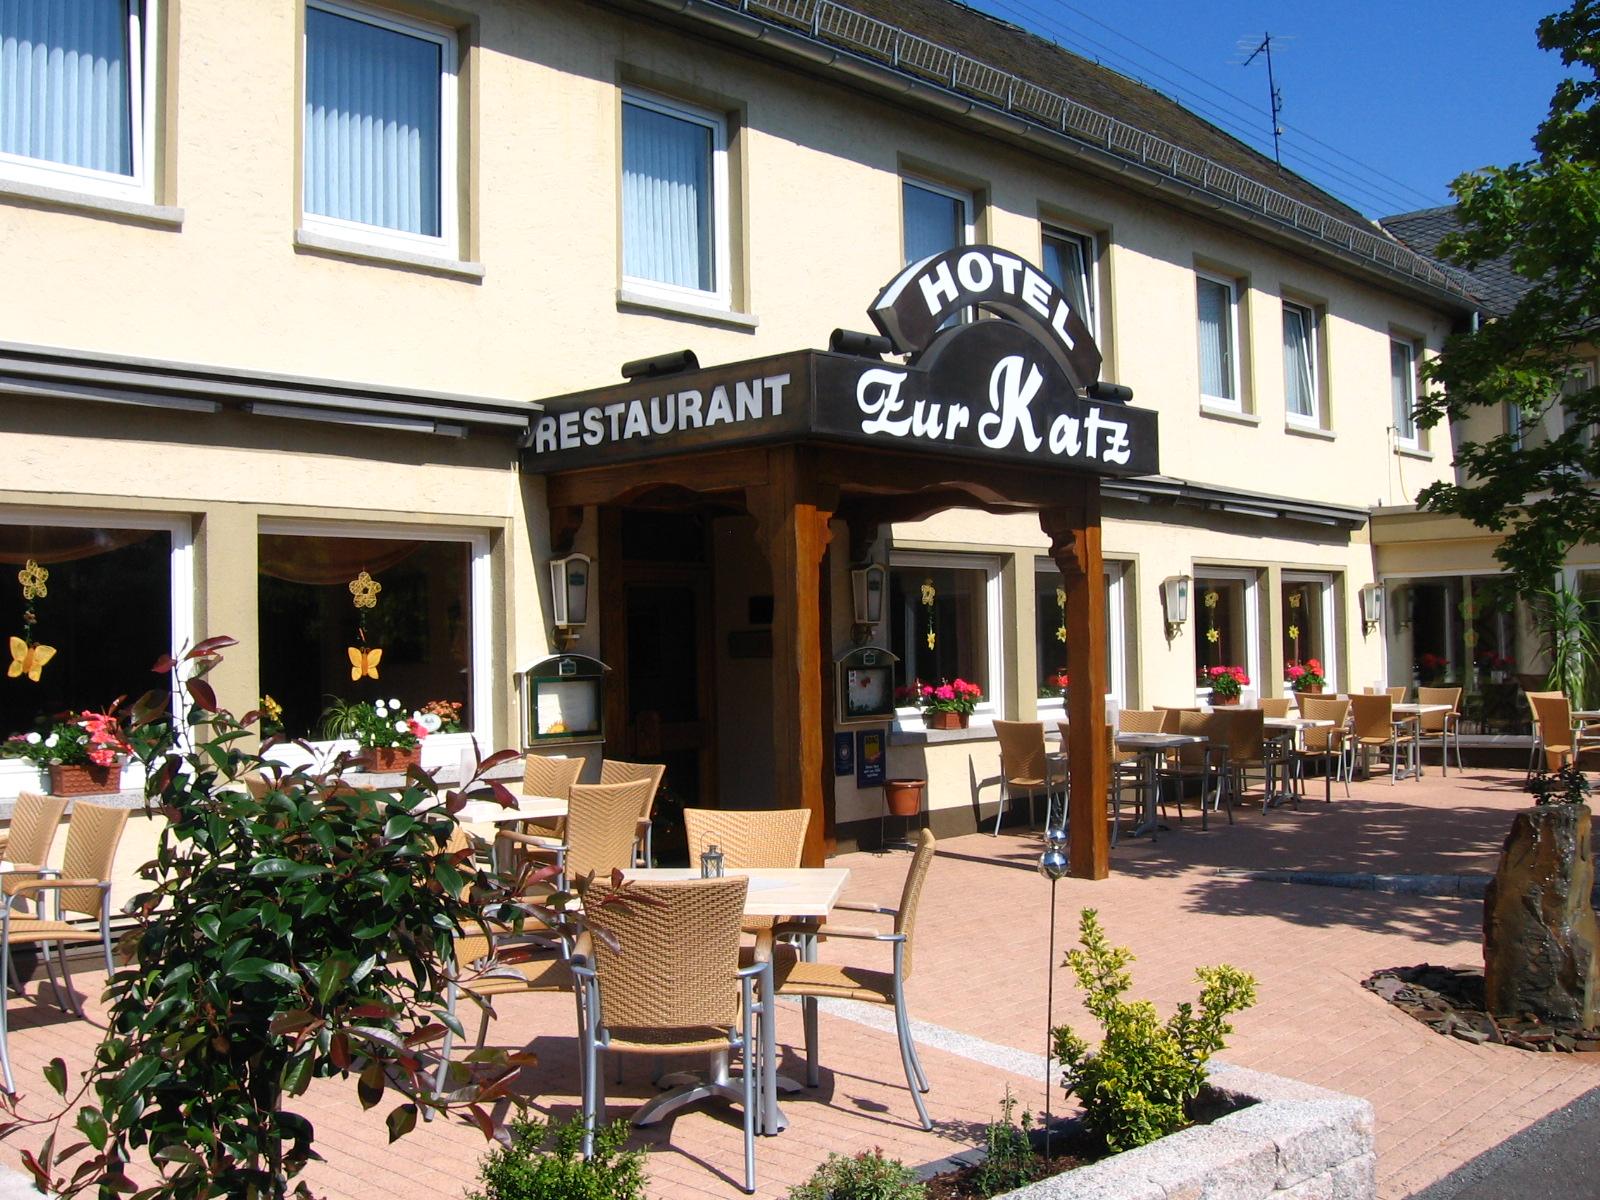 Hopezi.de: Landhotel-Restaurant zur Katz,56283,Halsenbach